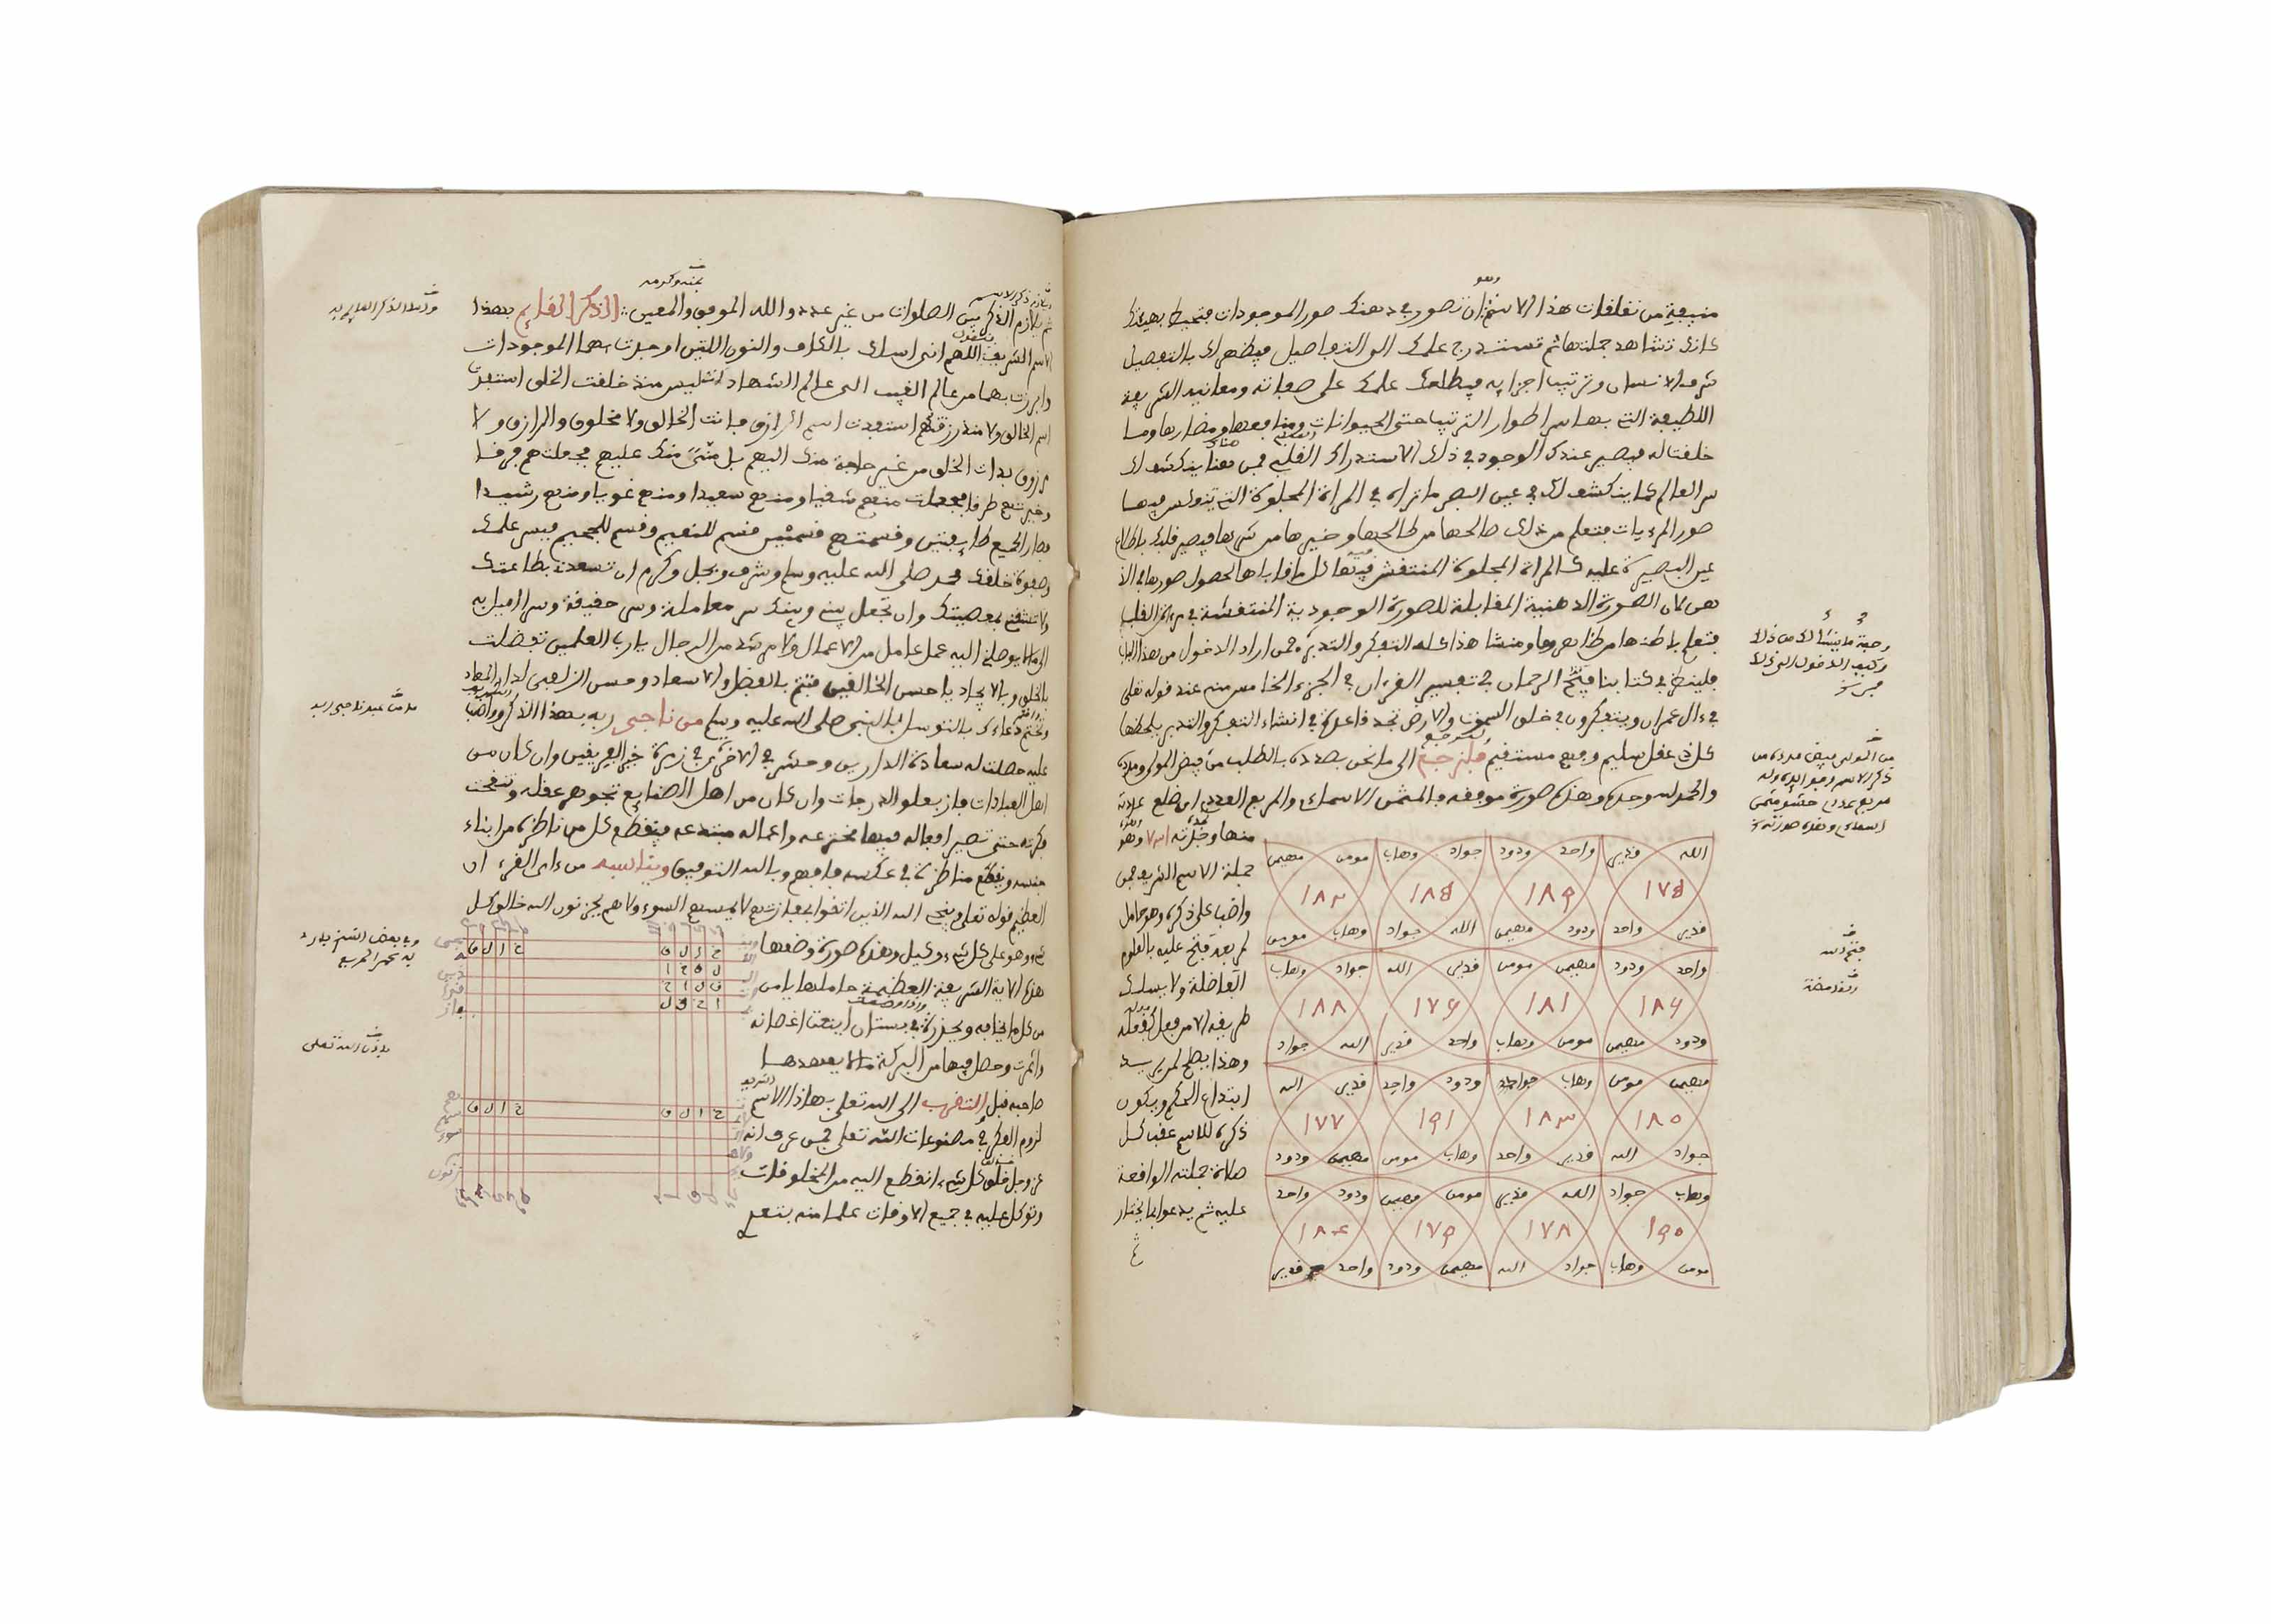 IBN QARQAMAS: A MANUAL ON ARITHMANCY